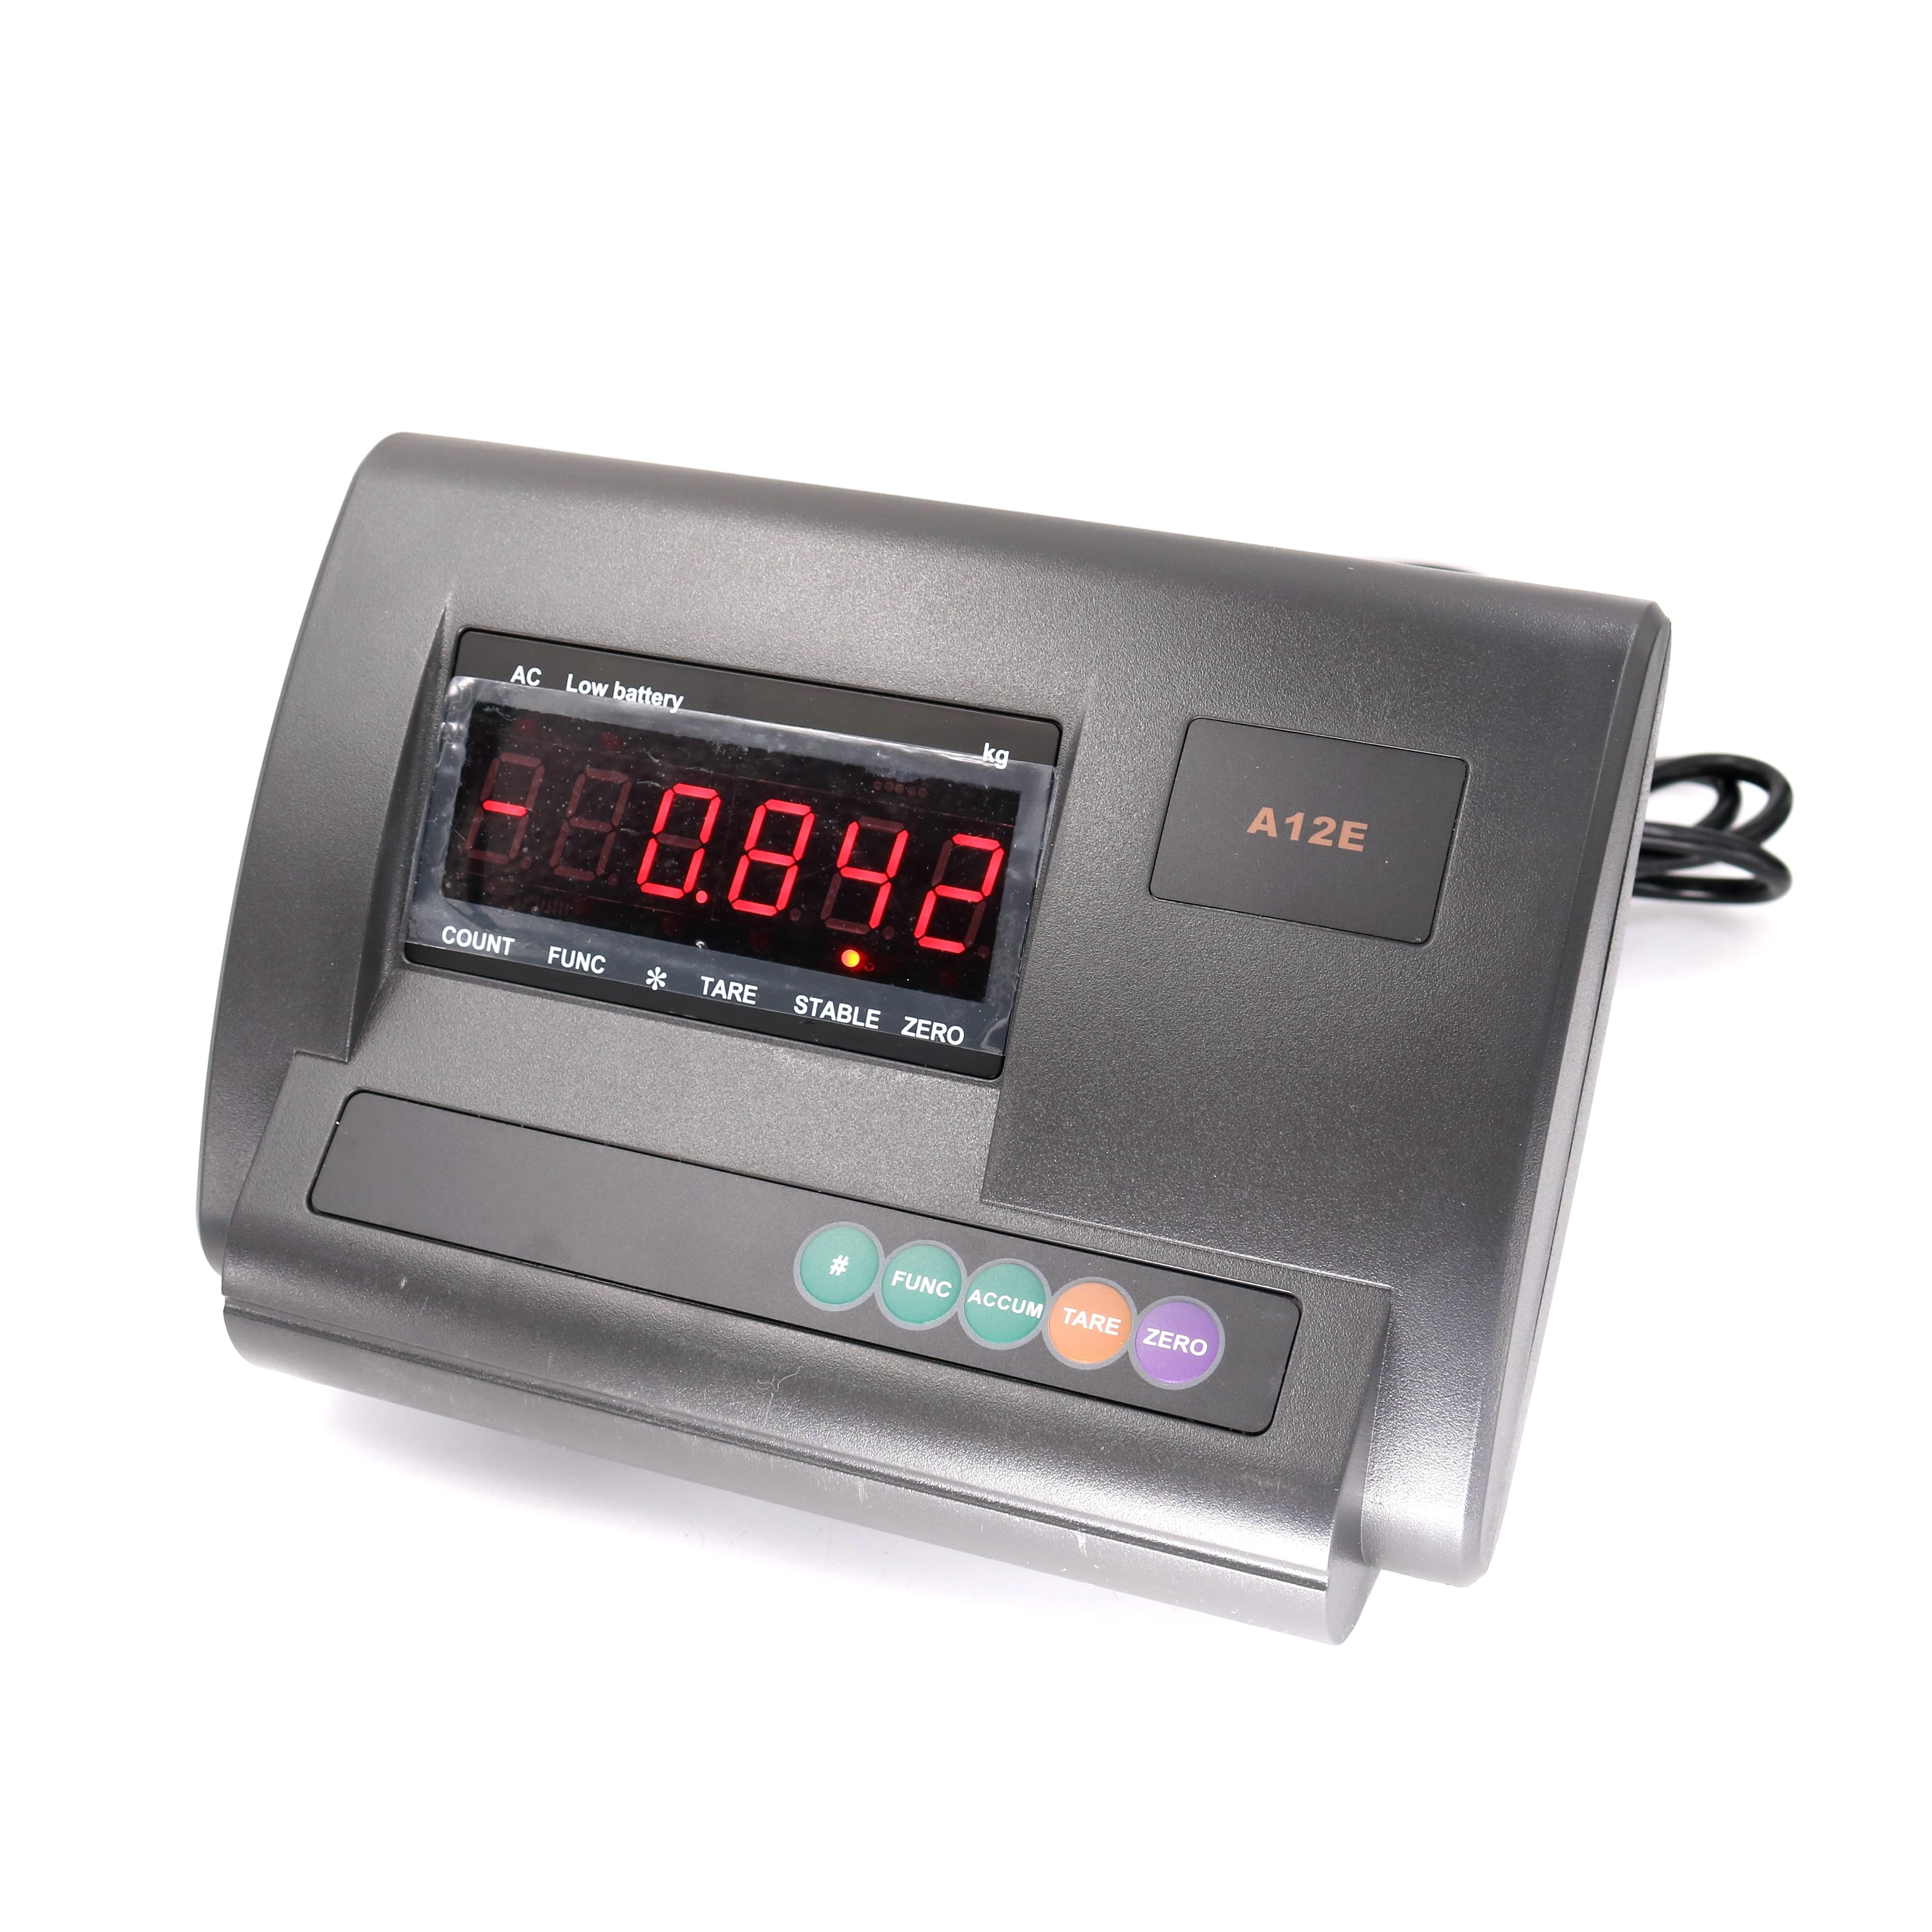 XK3190-A12E Platform Scale English LED Display Panel Weight Indicatorload Meter Controller Loadometer Weight Meter Module